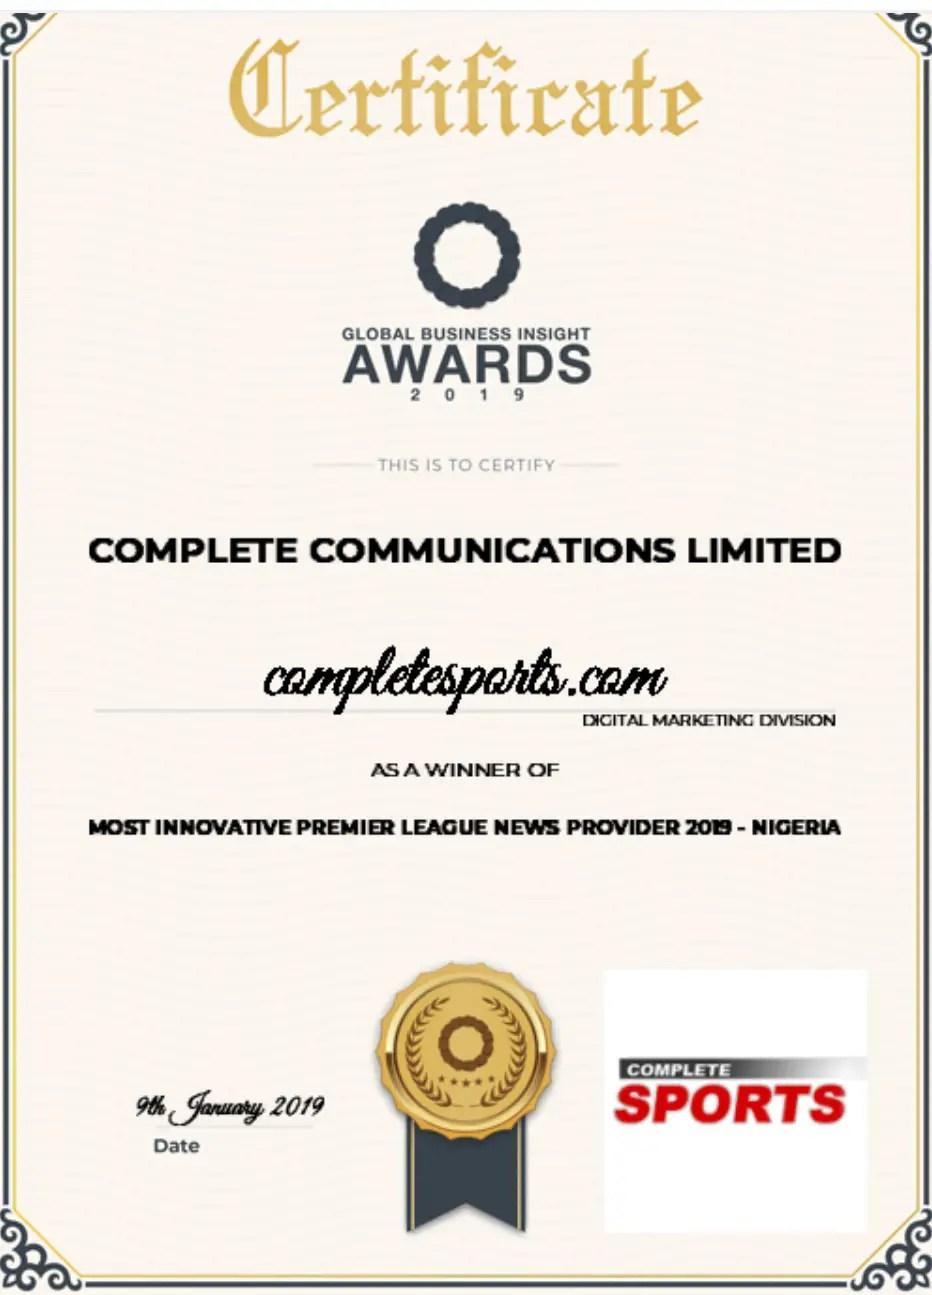 CompleteSports.com Wins Business Insight Award For Most Innovative Premier League News Provider 2018/2019 (Nigeria)